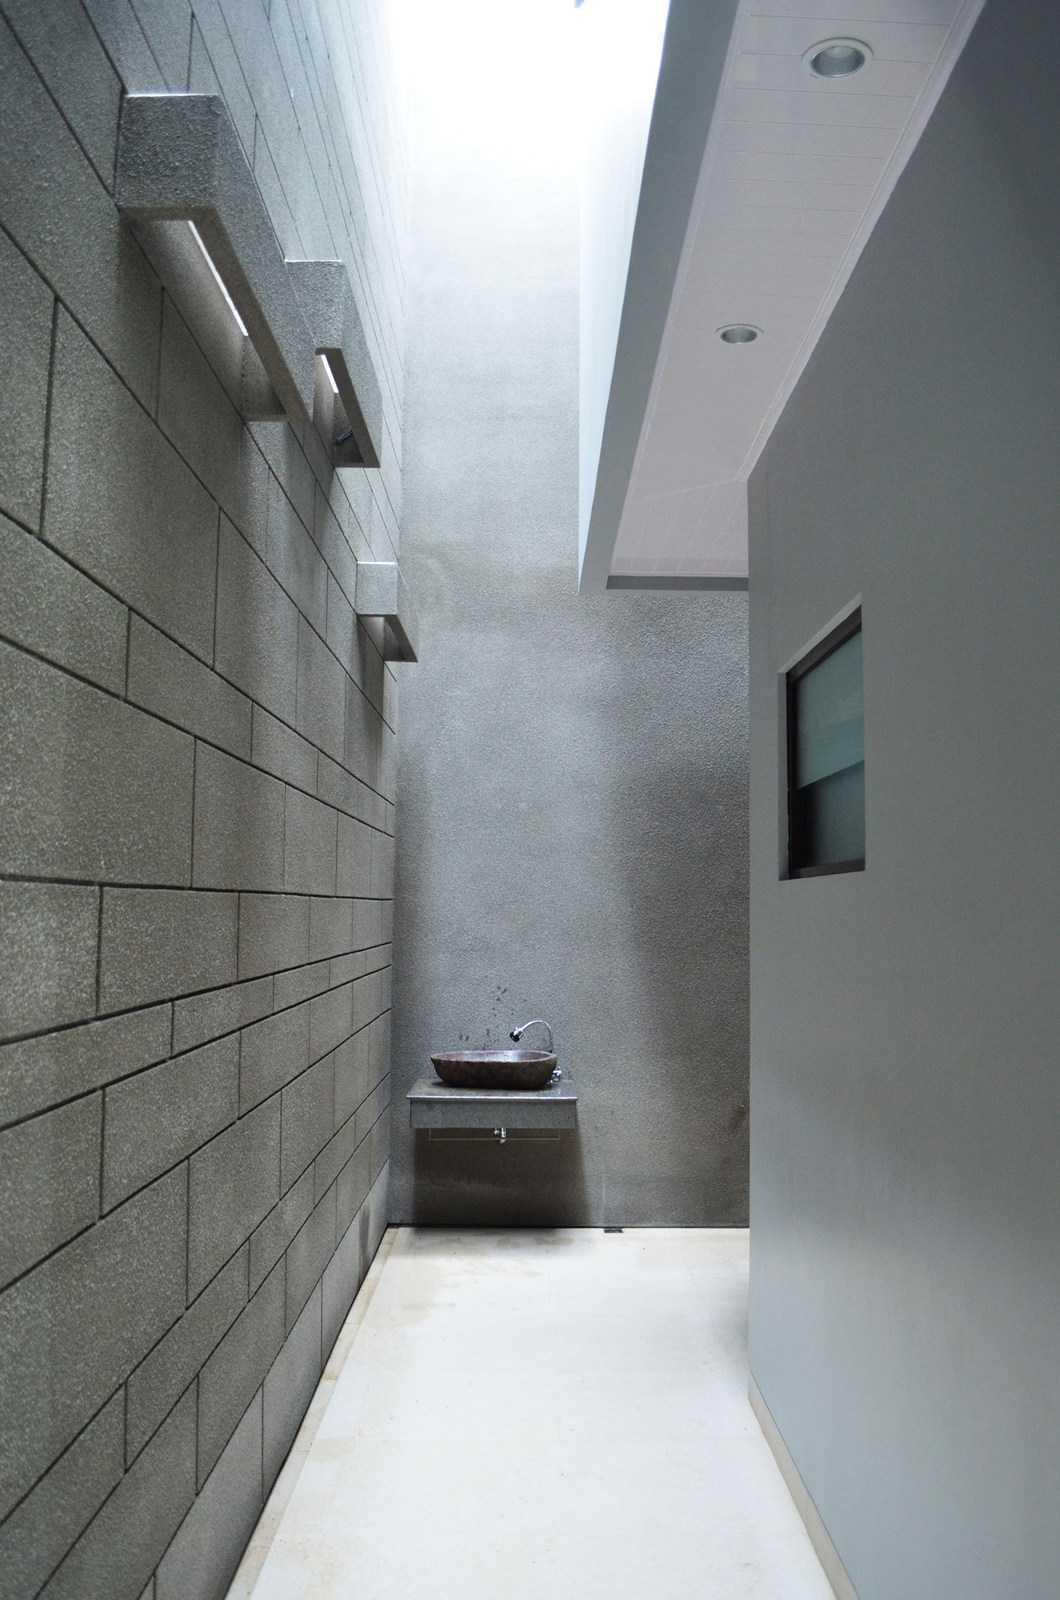 X3M Architects Nittaya A3 15 House Bsd Bsd Interior - Wall   25309